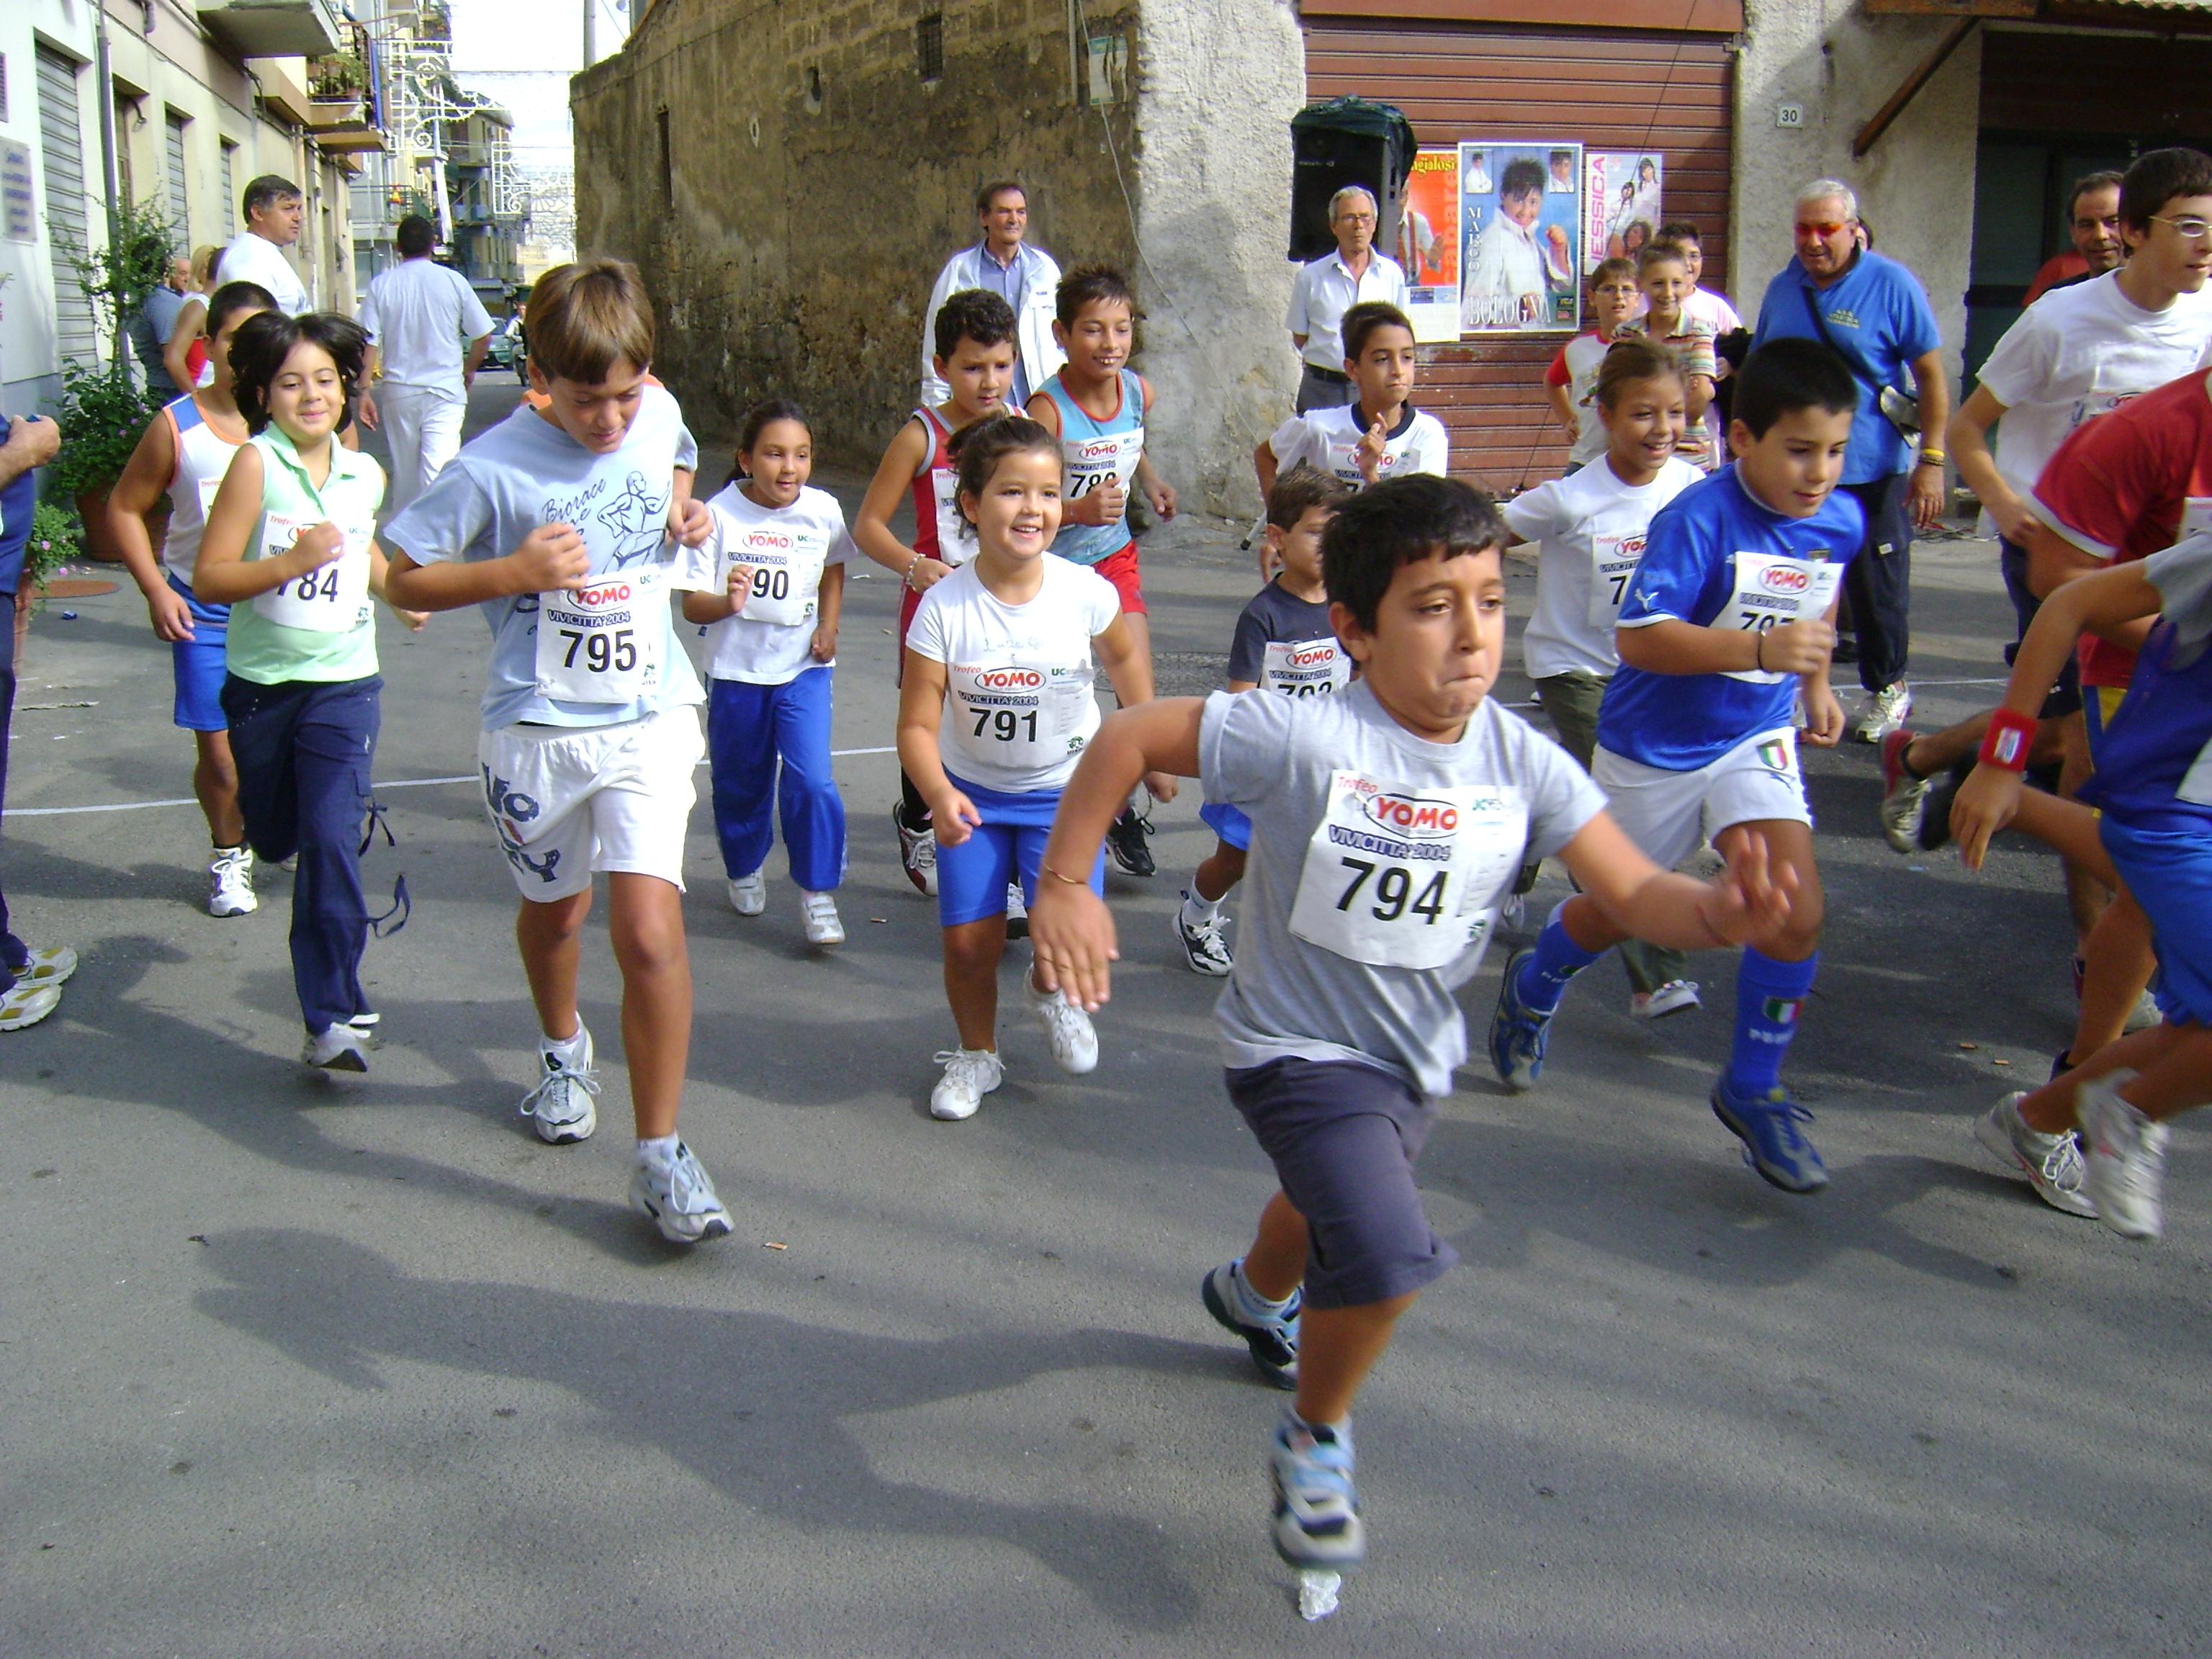 Tutte le immagini del 4° Trofeo San Gabriele Arcangelo